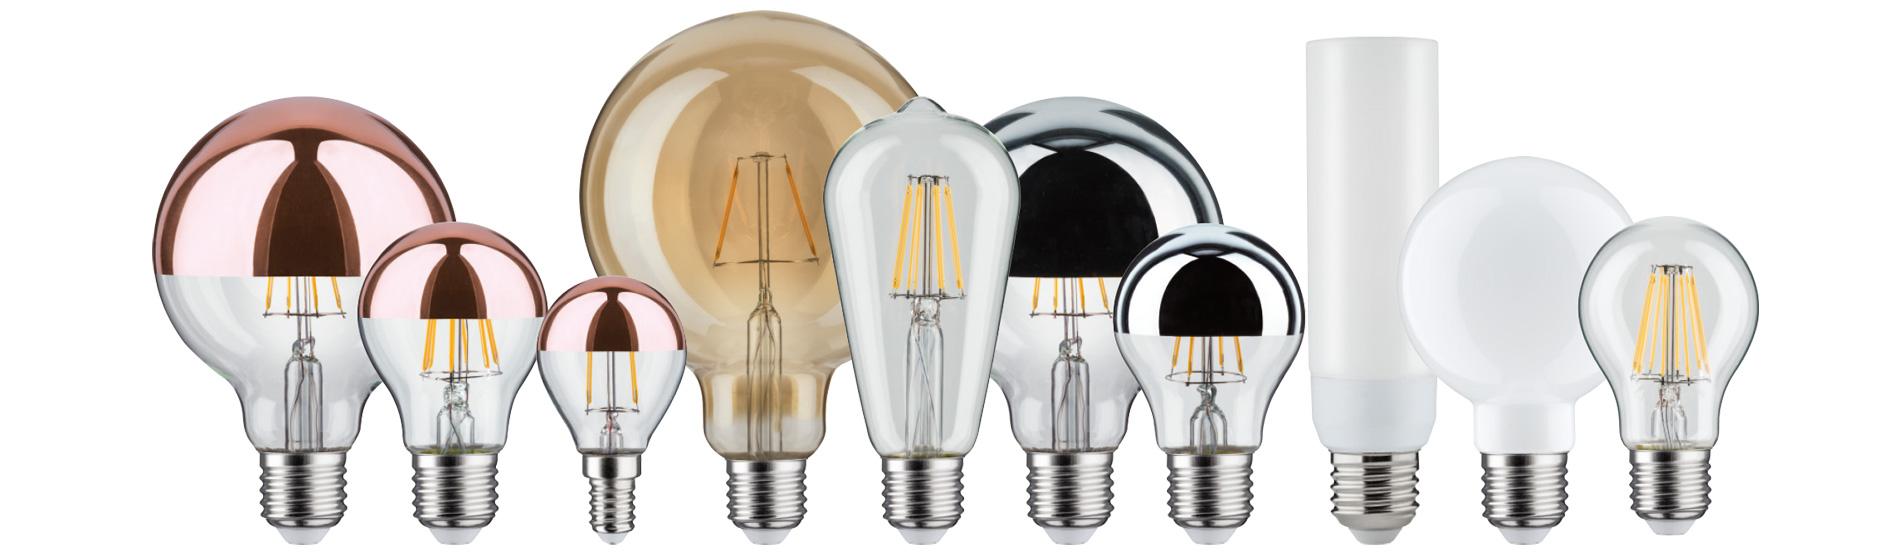 LAMPEN-RAMPE.DE   gnadenlos günstige Markenleuchten